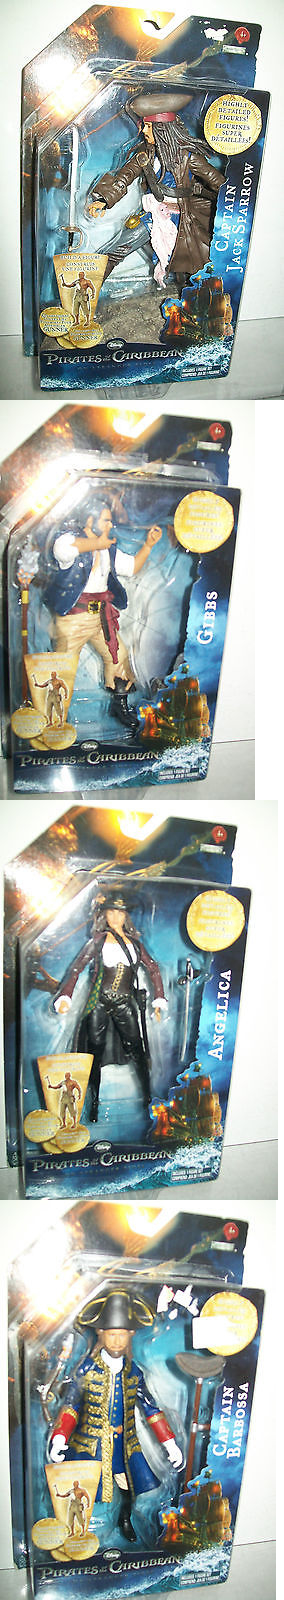 Pirates of the Caribbean 142334: Pirates Of The Caribbean On Stranger Tides 6 Figure Set -> BUY IT NOW ONLY: $44.99 on eBay!